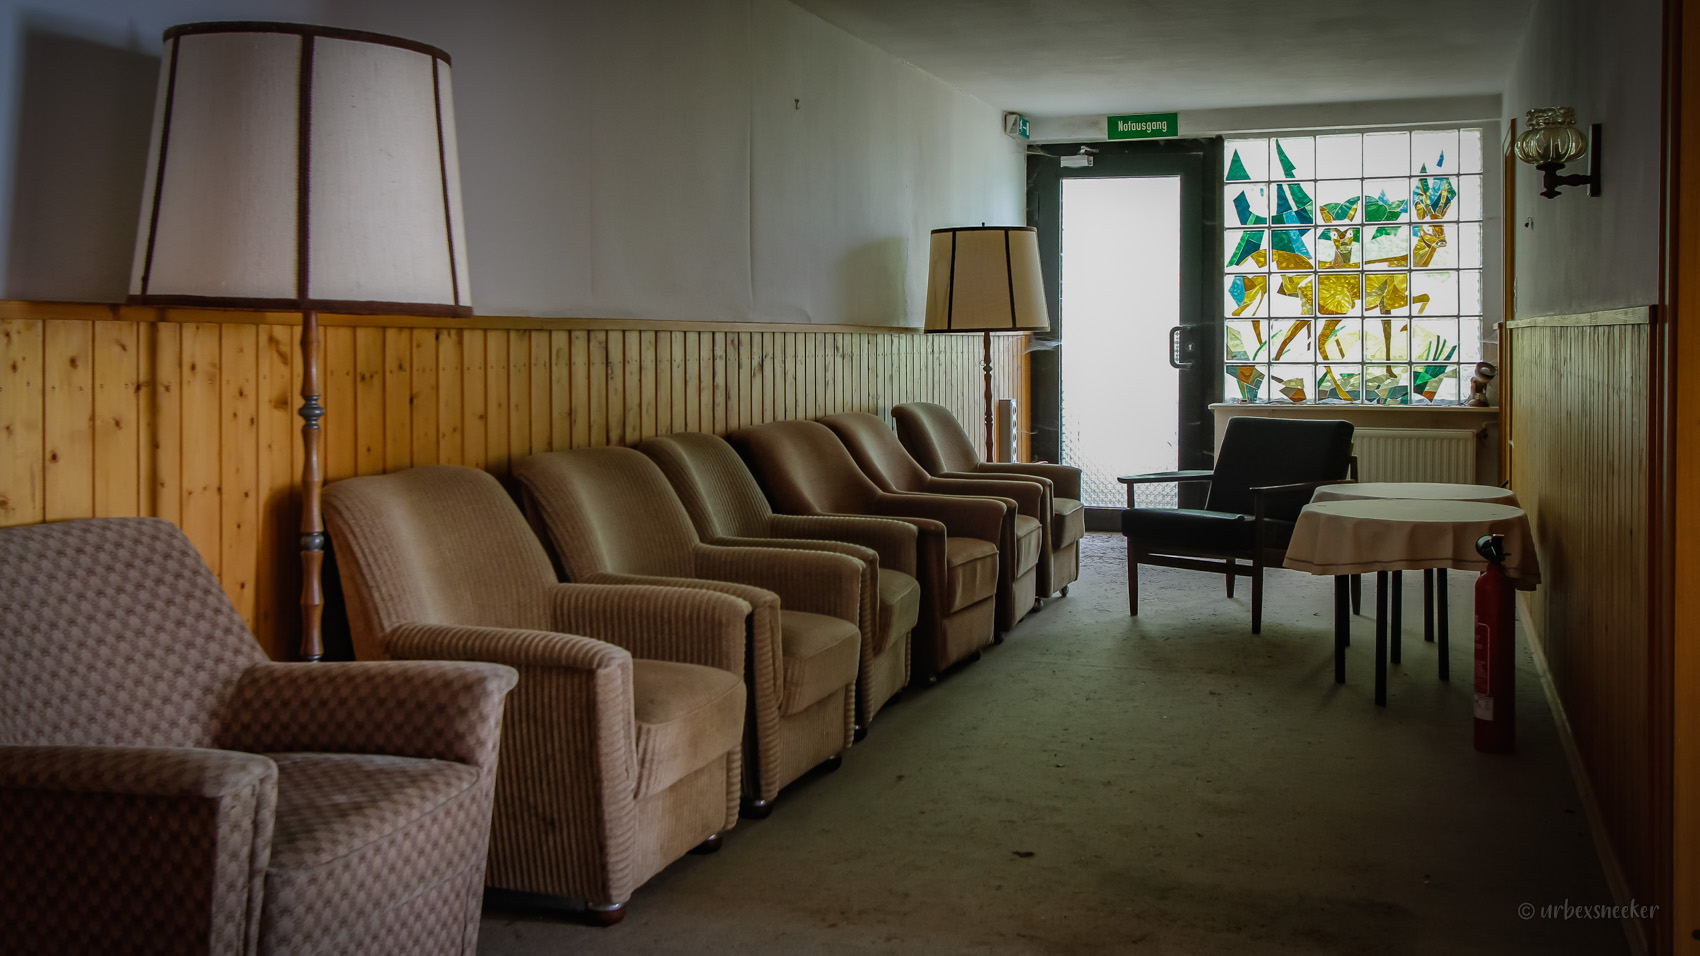 lost hotel harz rehbock fenster